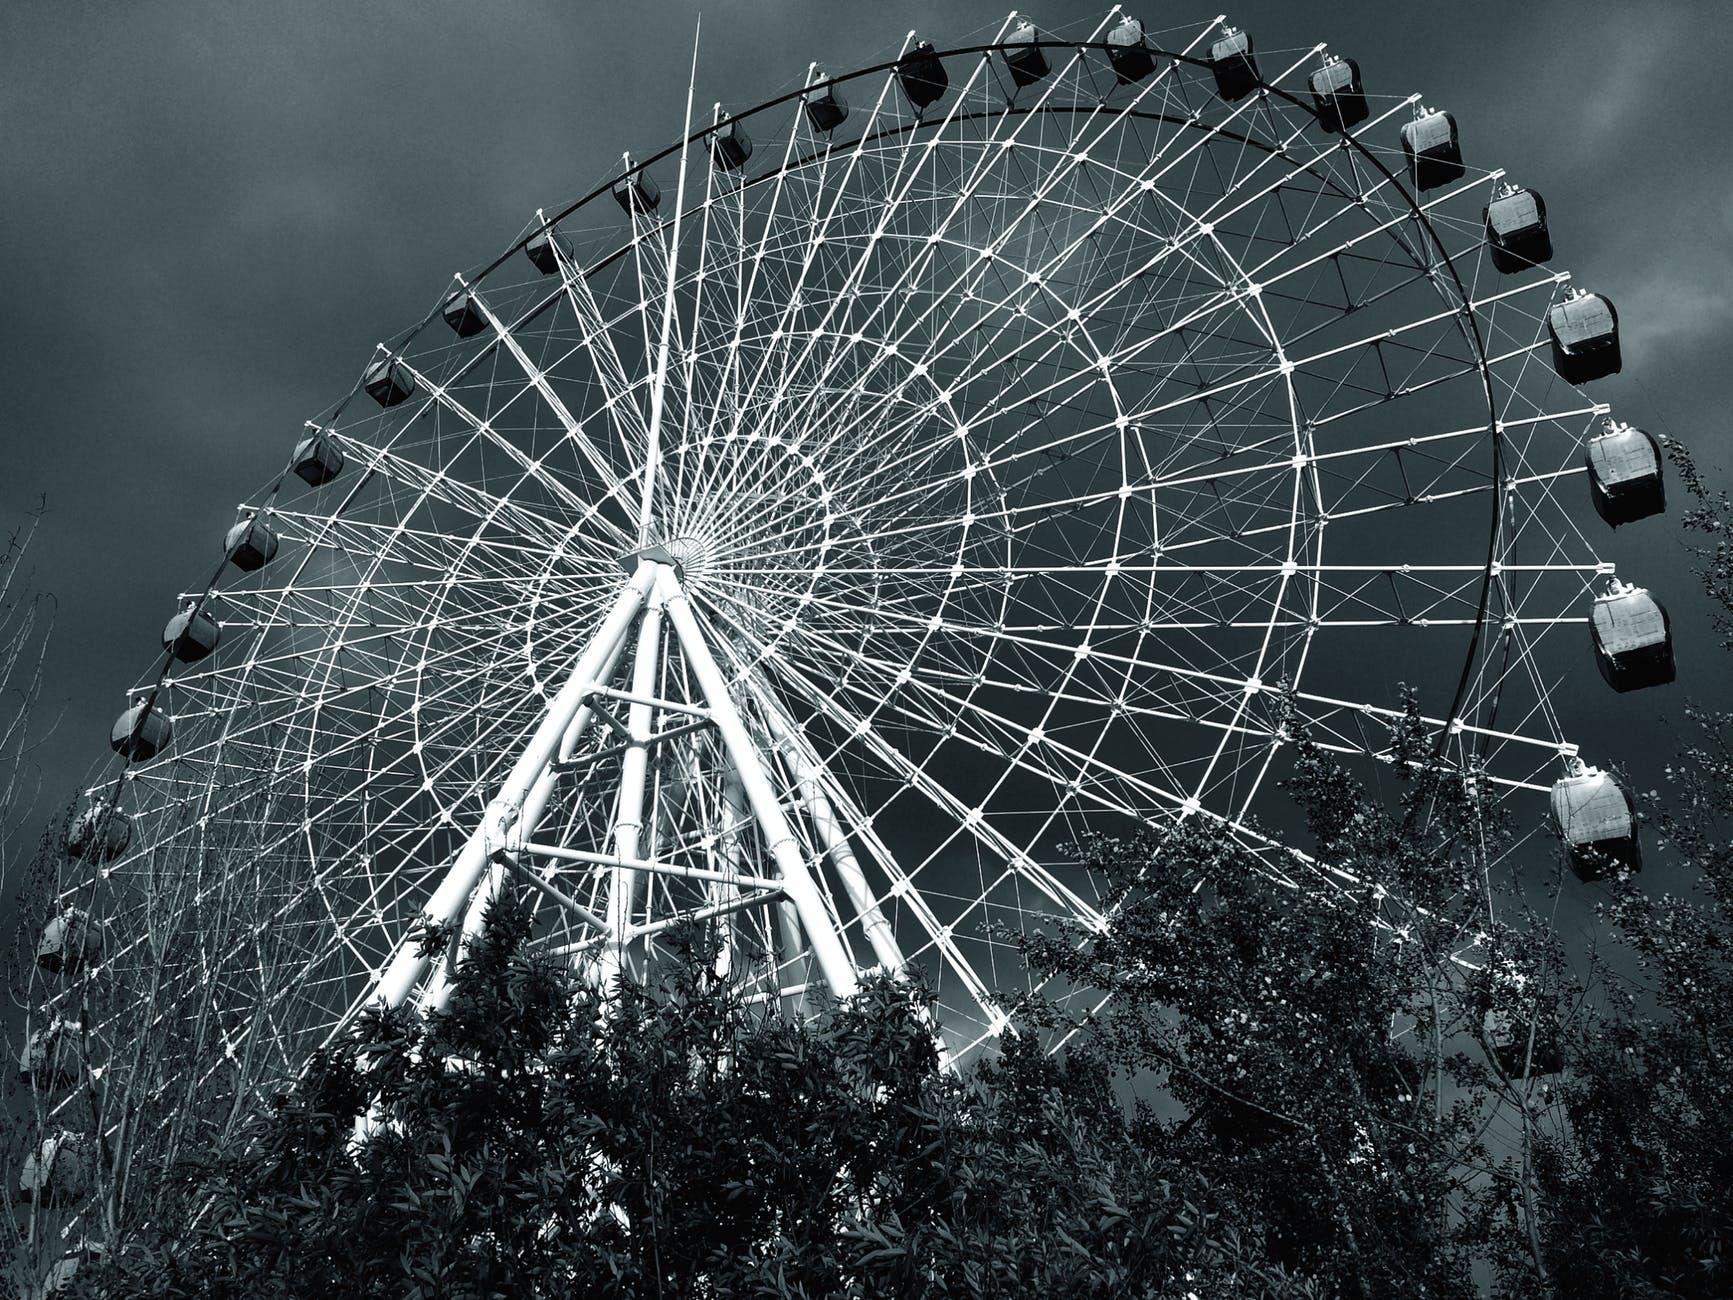 amusement park attraction big black and white